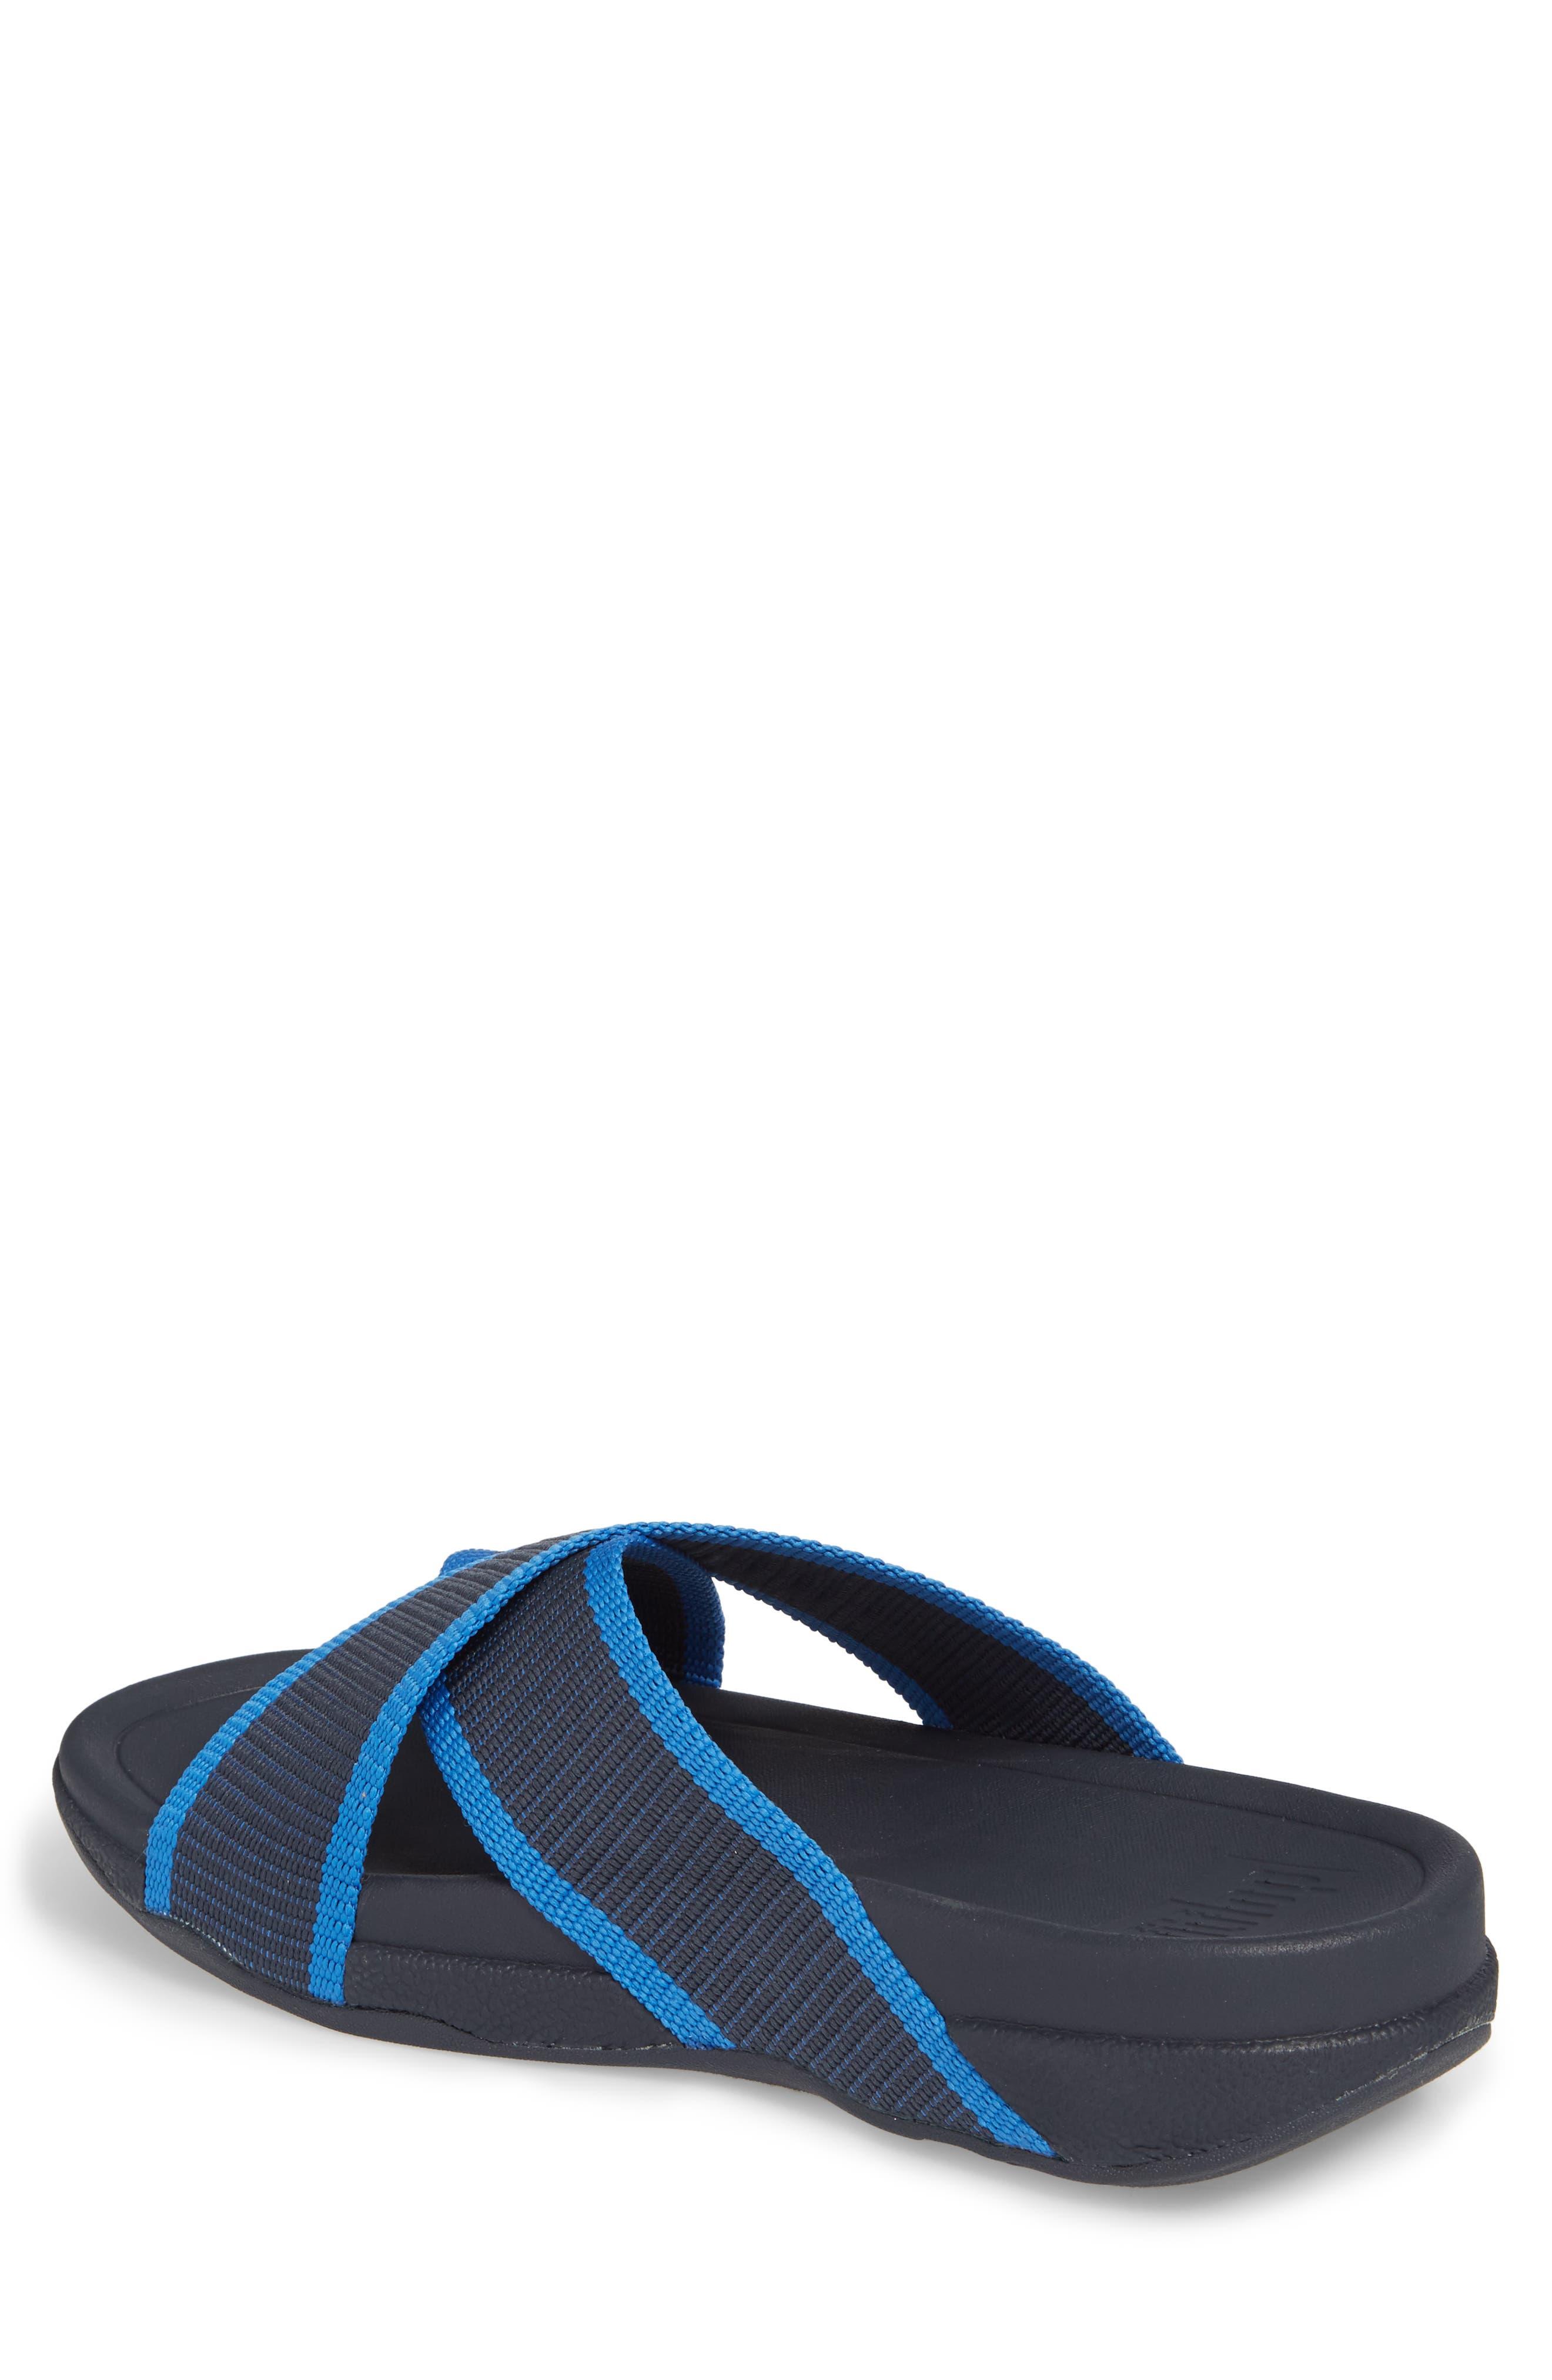 Surfer Slide Sandal,                             Alternate thumbnail 2, color,                             SUPERNAVY BLUE